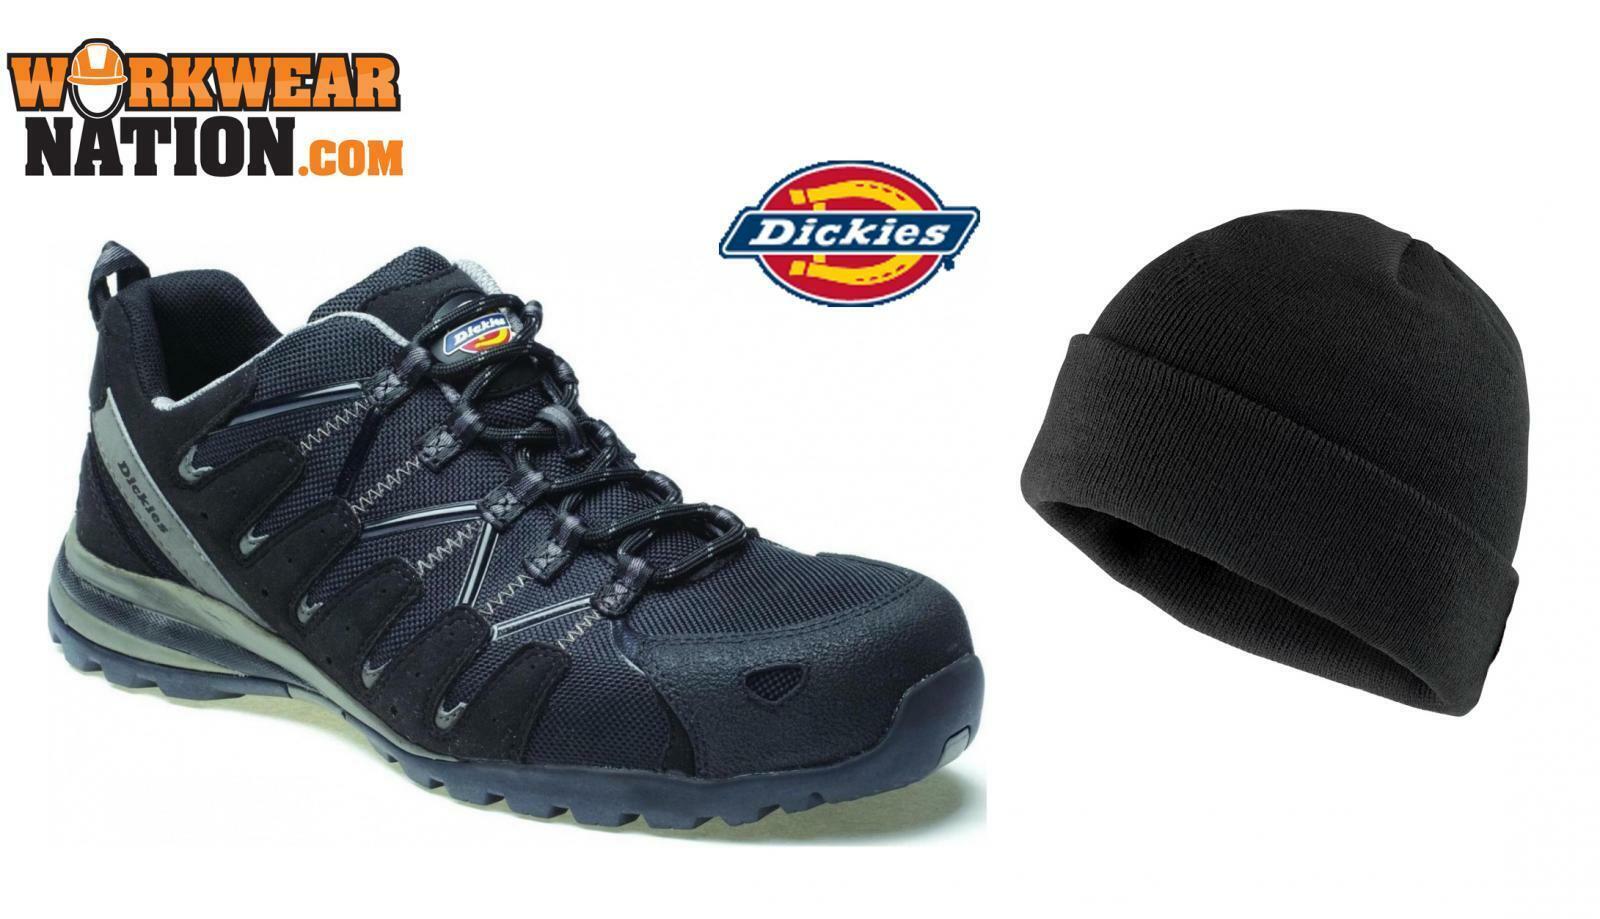 Da men Dickies Tiber shoes Sportive Antinfortunistiche, shoes, Dita Composite